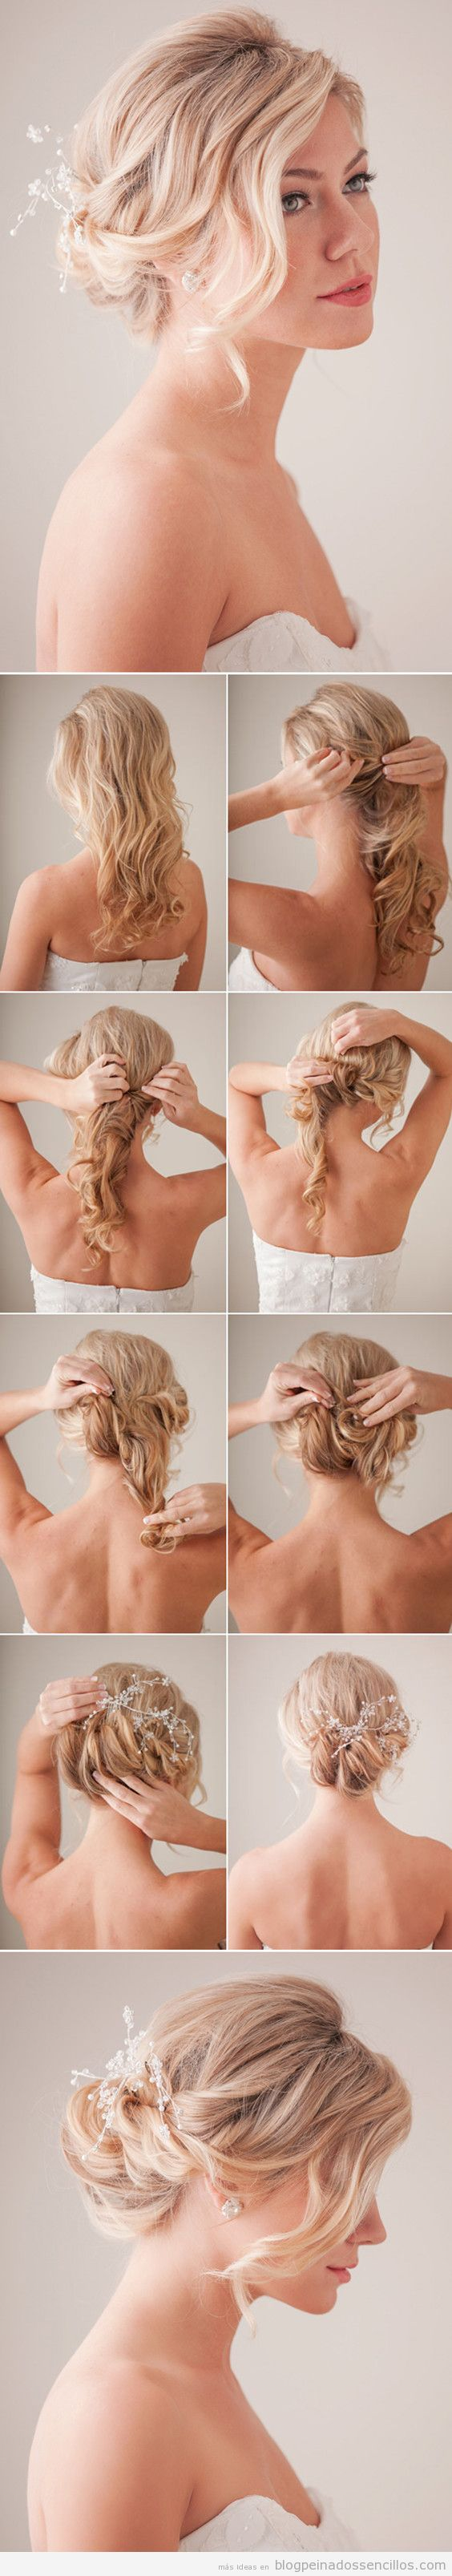 Peinados sencillos para novias a invitadas de boda, recogido boho 3